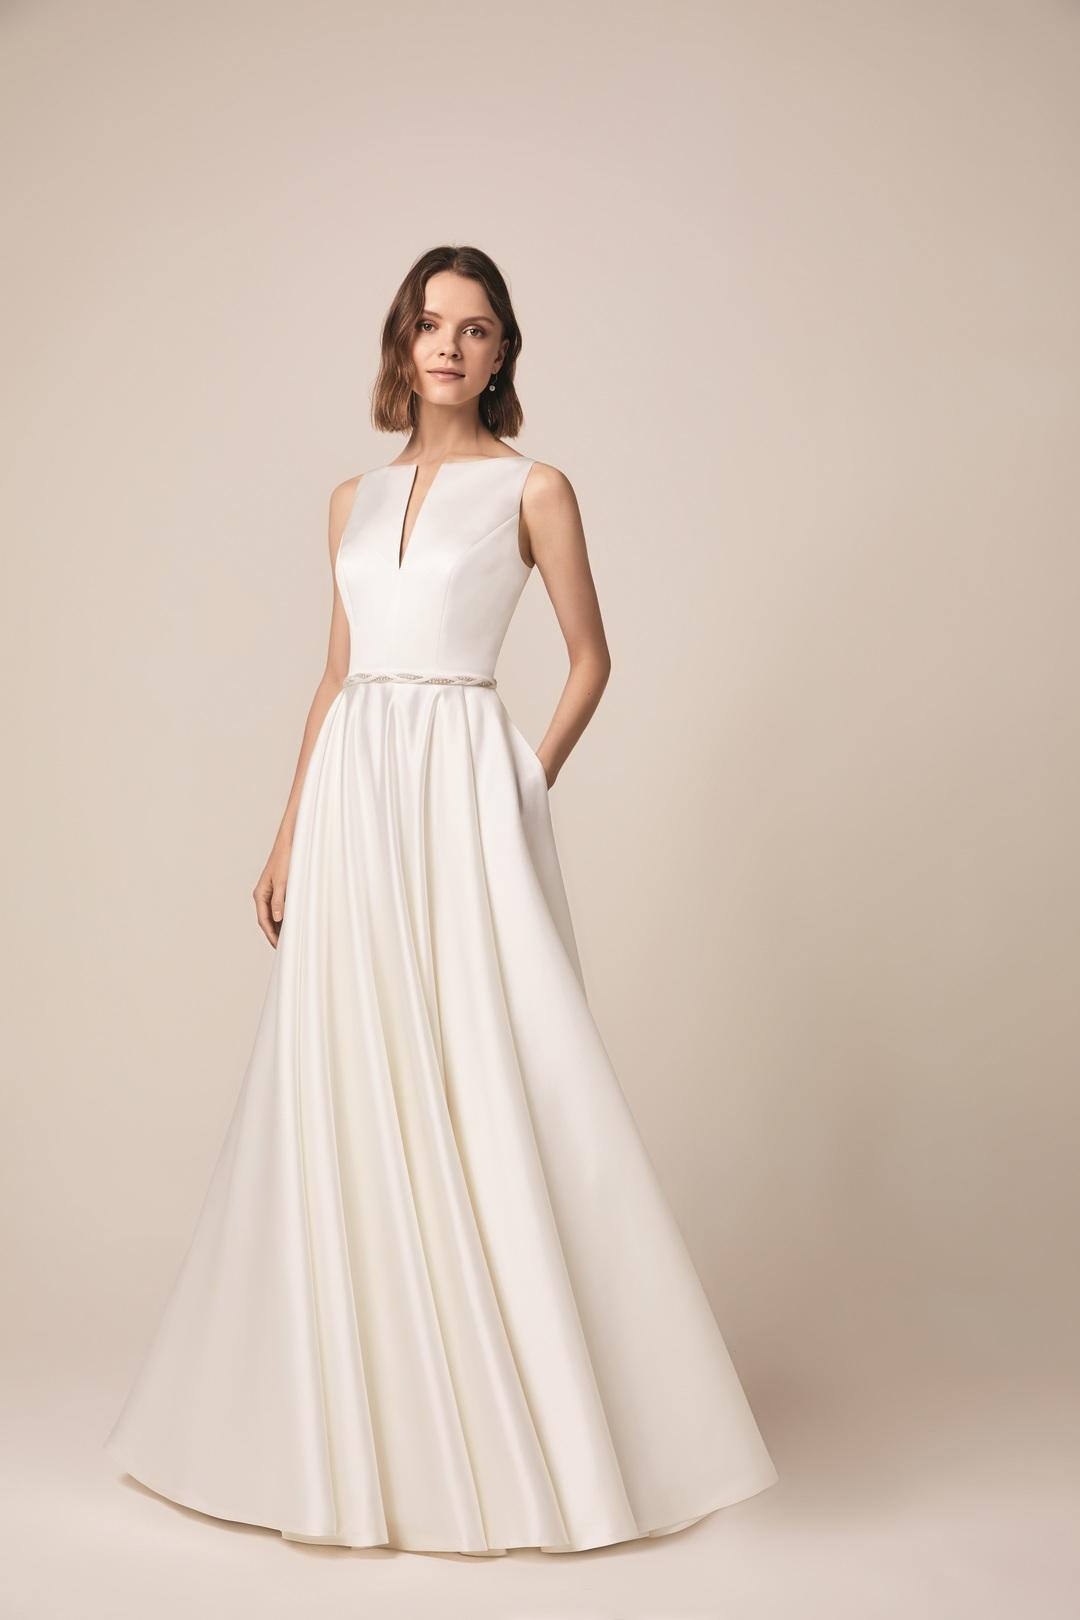 105 dress photo